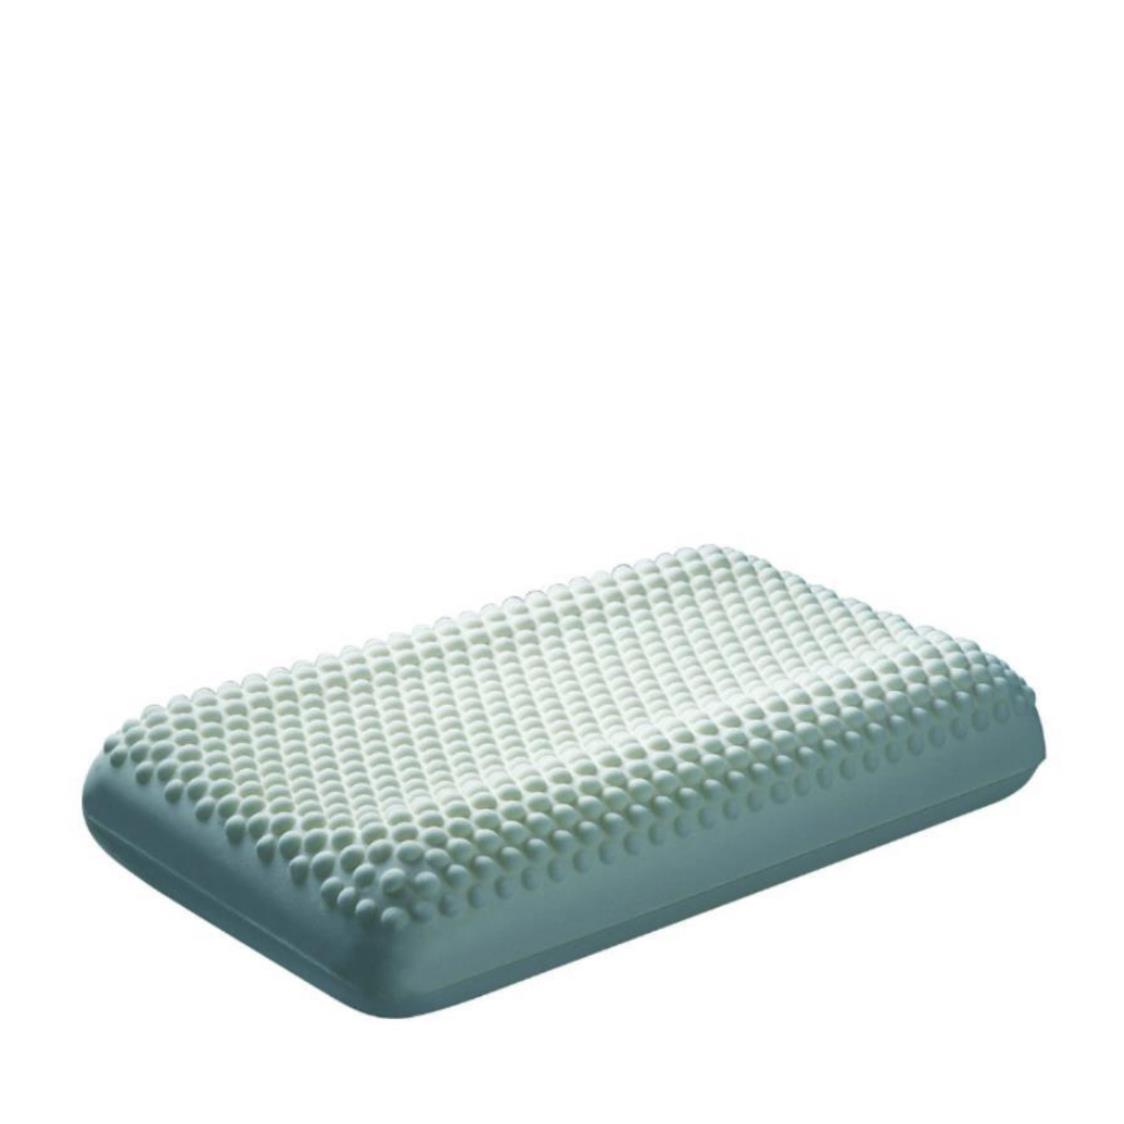 Dentons Therapeutic Pillow Caress Profile